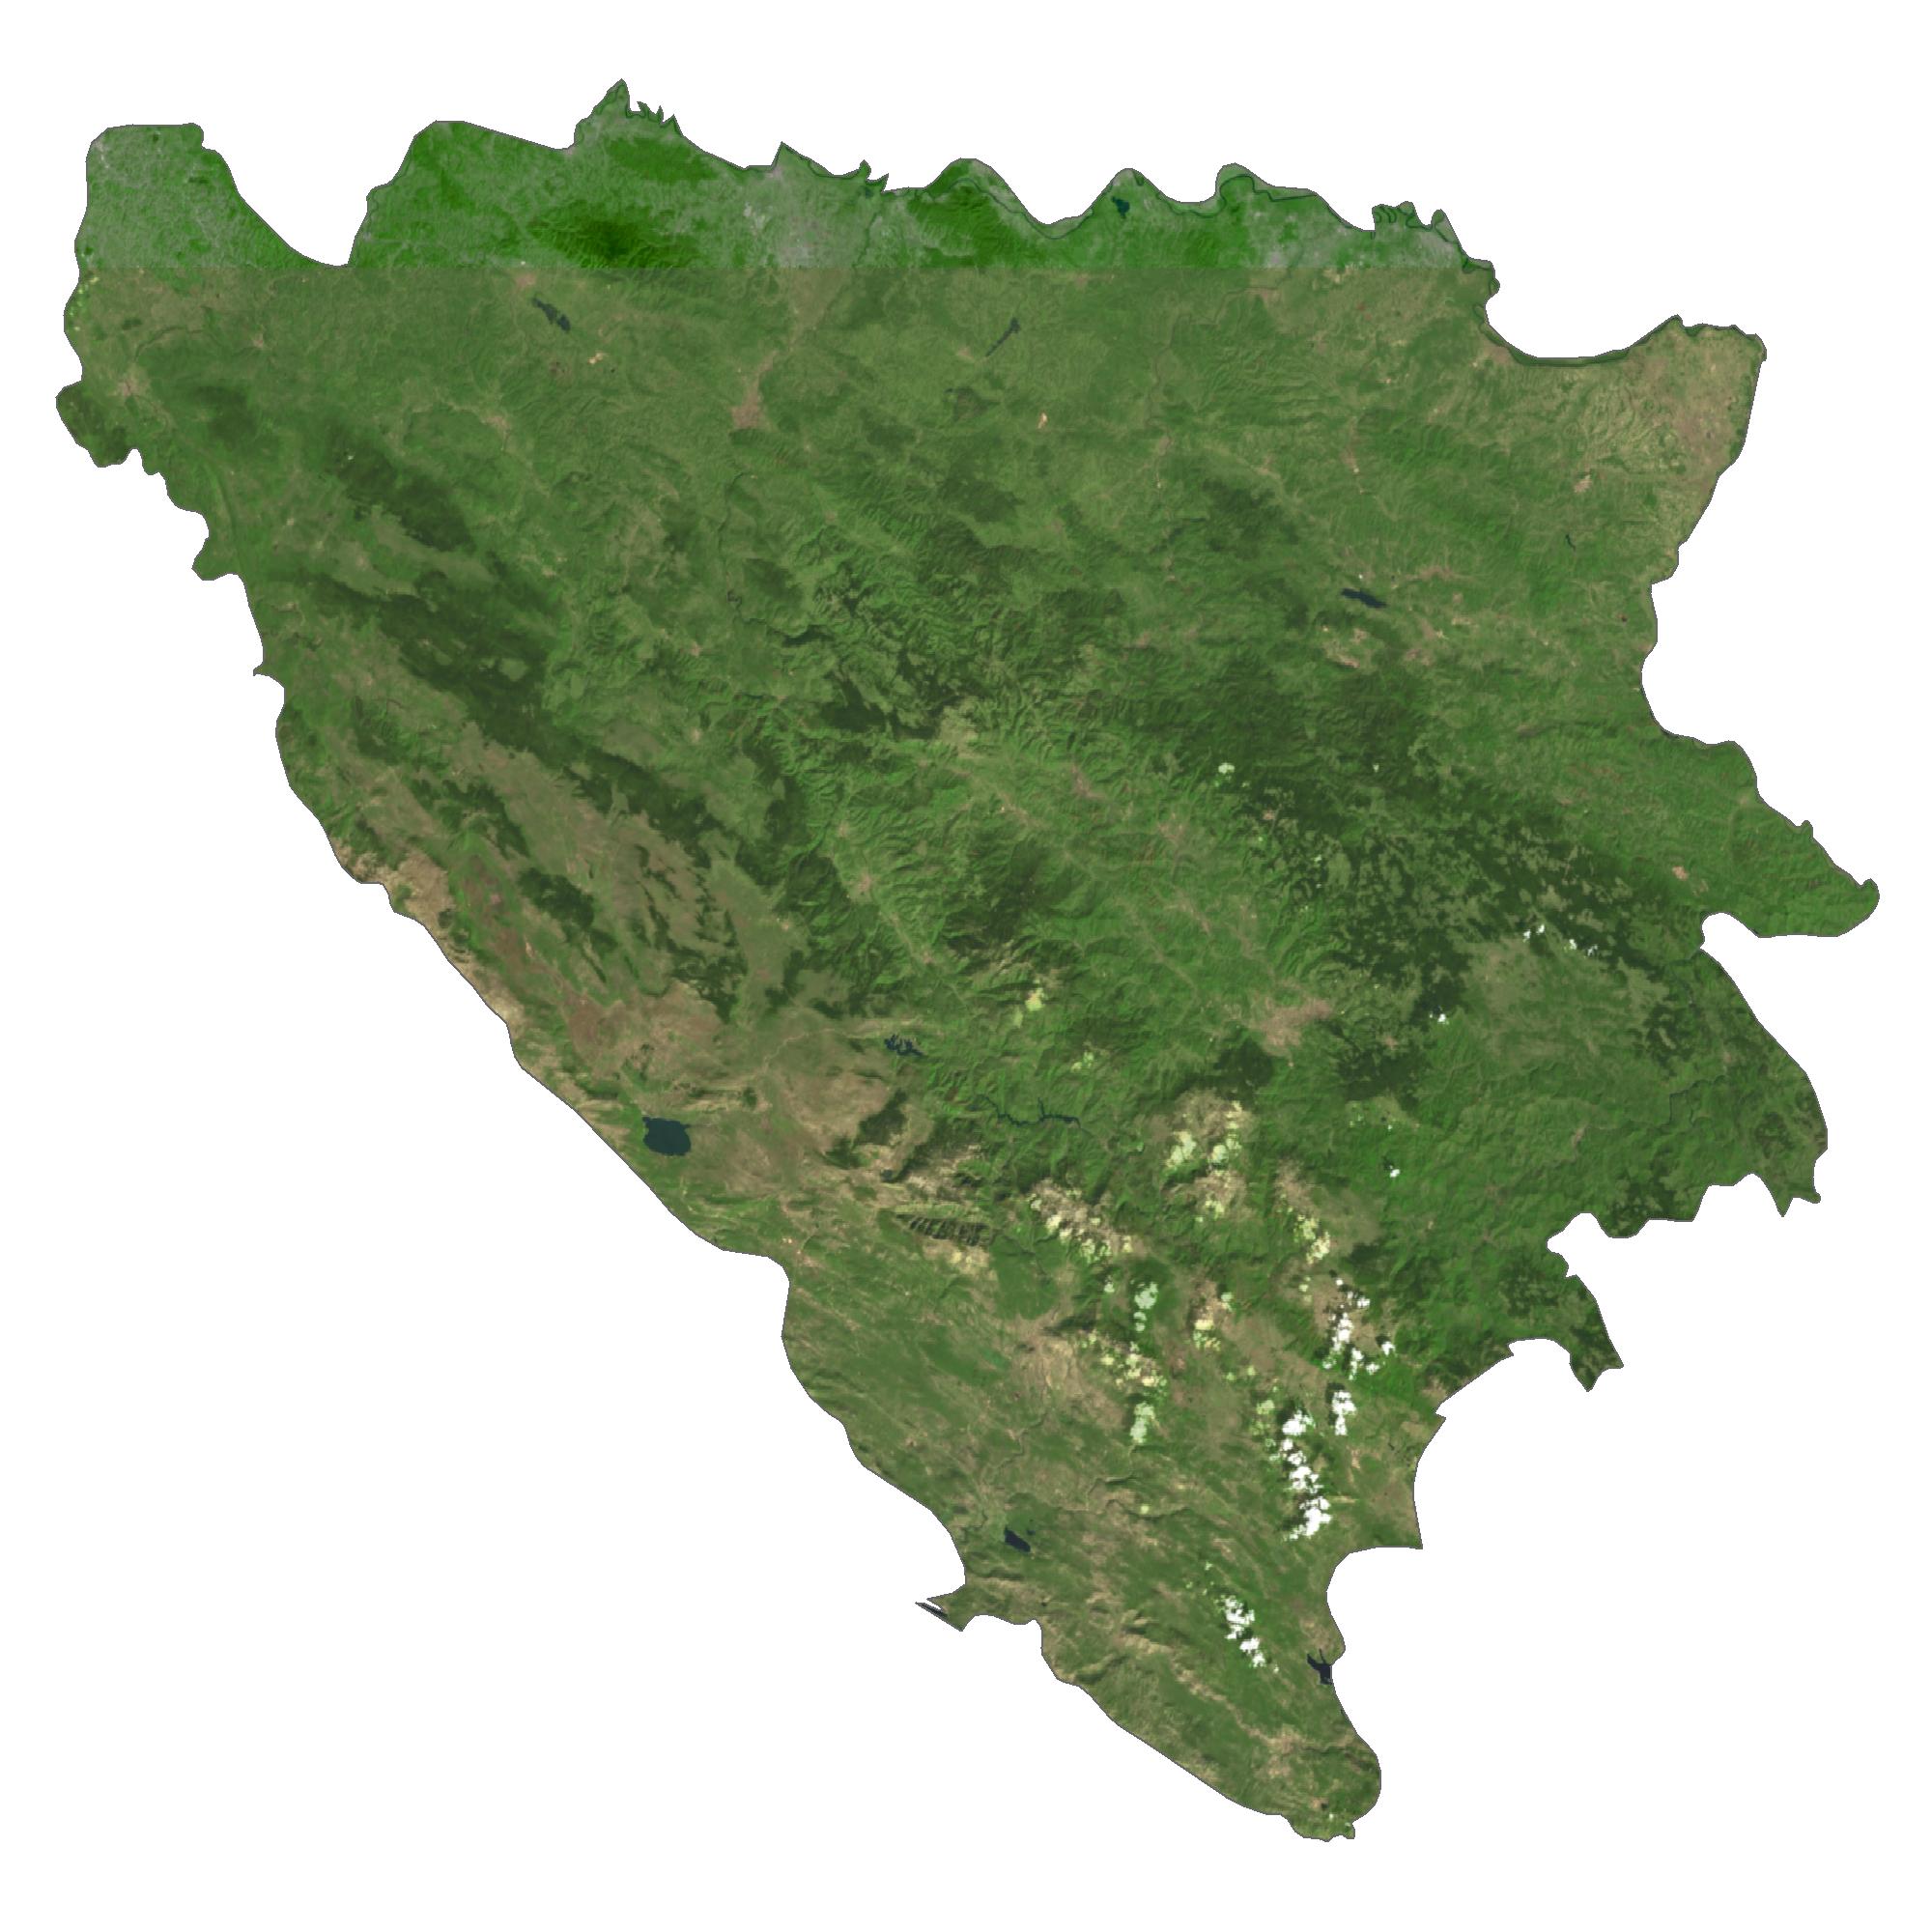 Bosnia and Herzegovina Saetllite Map